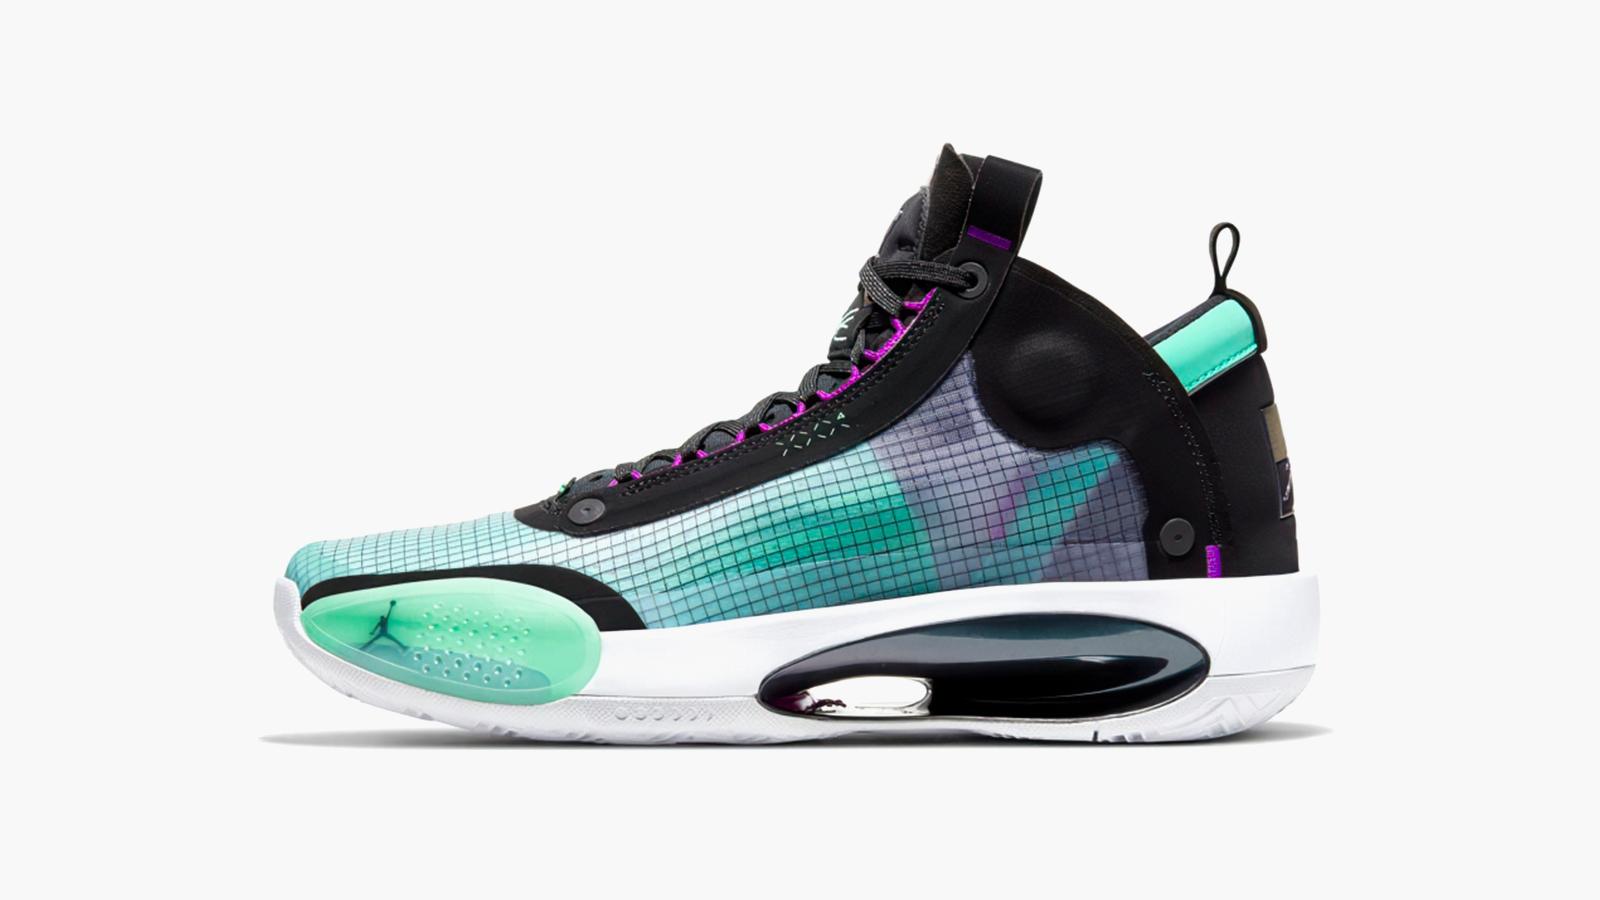 2019/2020 NBA Sneaker Guide - IMBOLDN